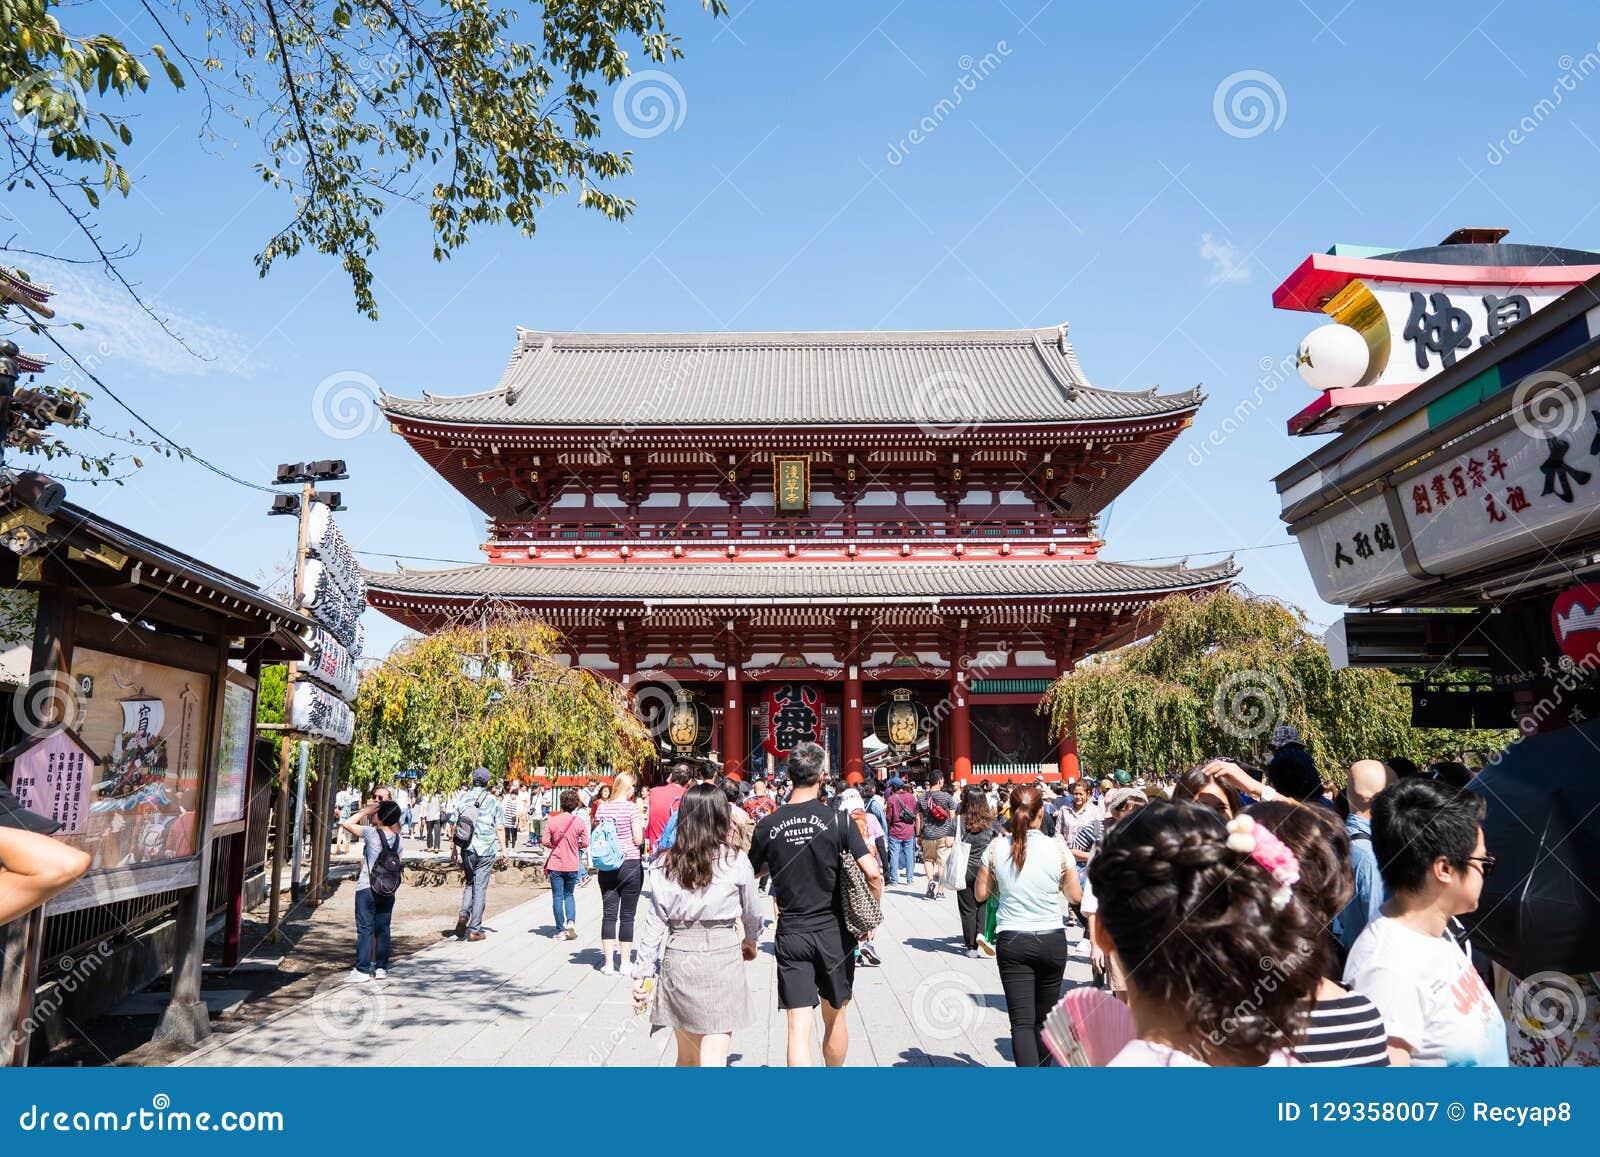 Tokyo, Japan - October 7, 2018: tourist are walking and visiting Sensoji Temple